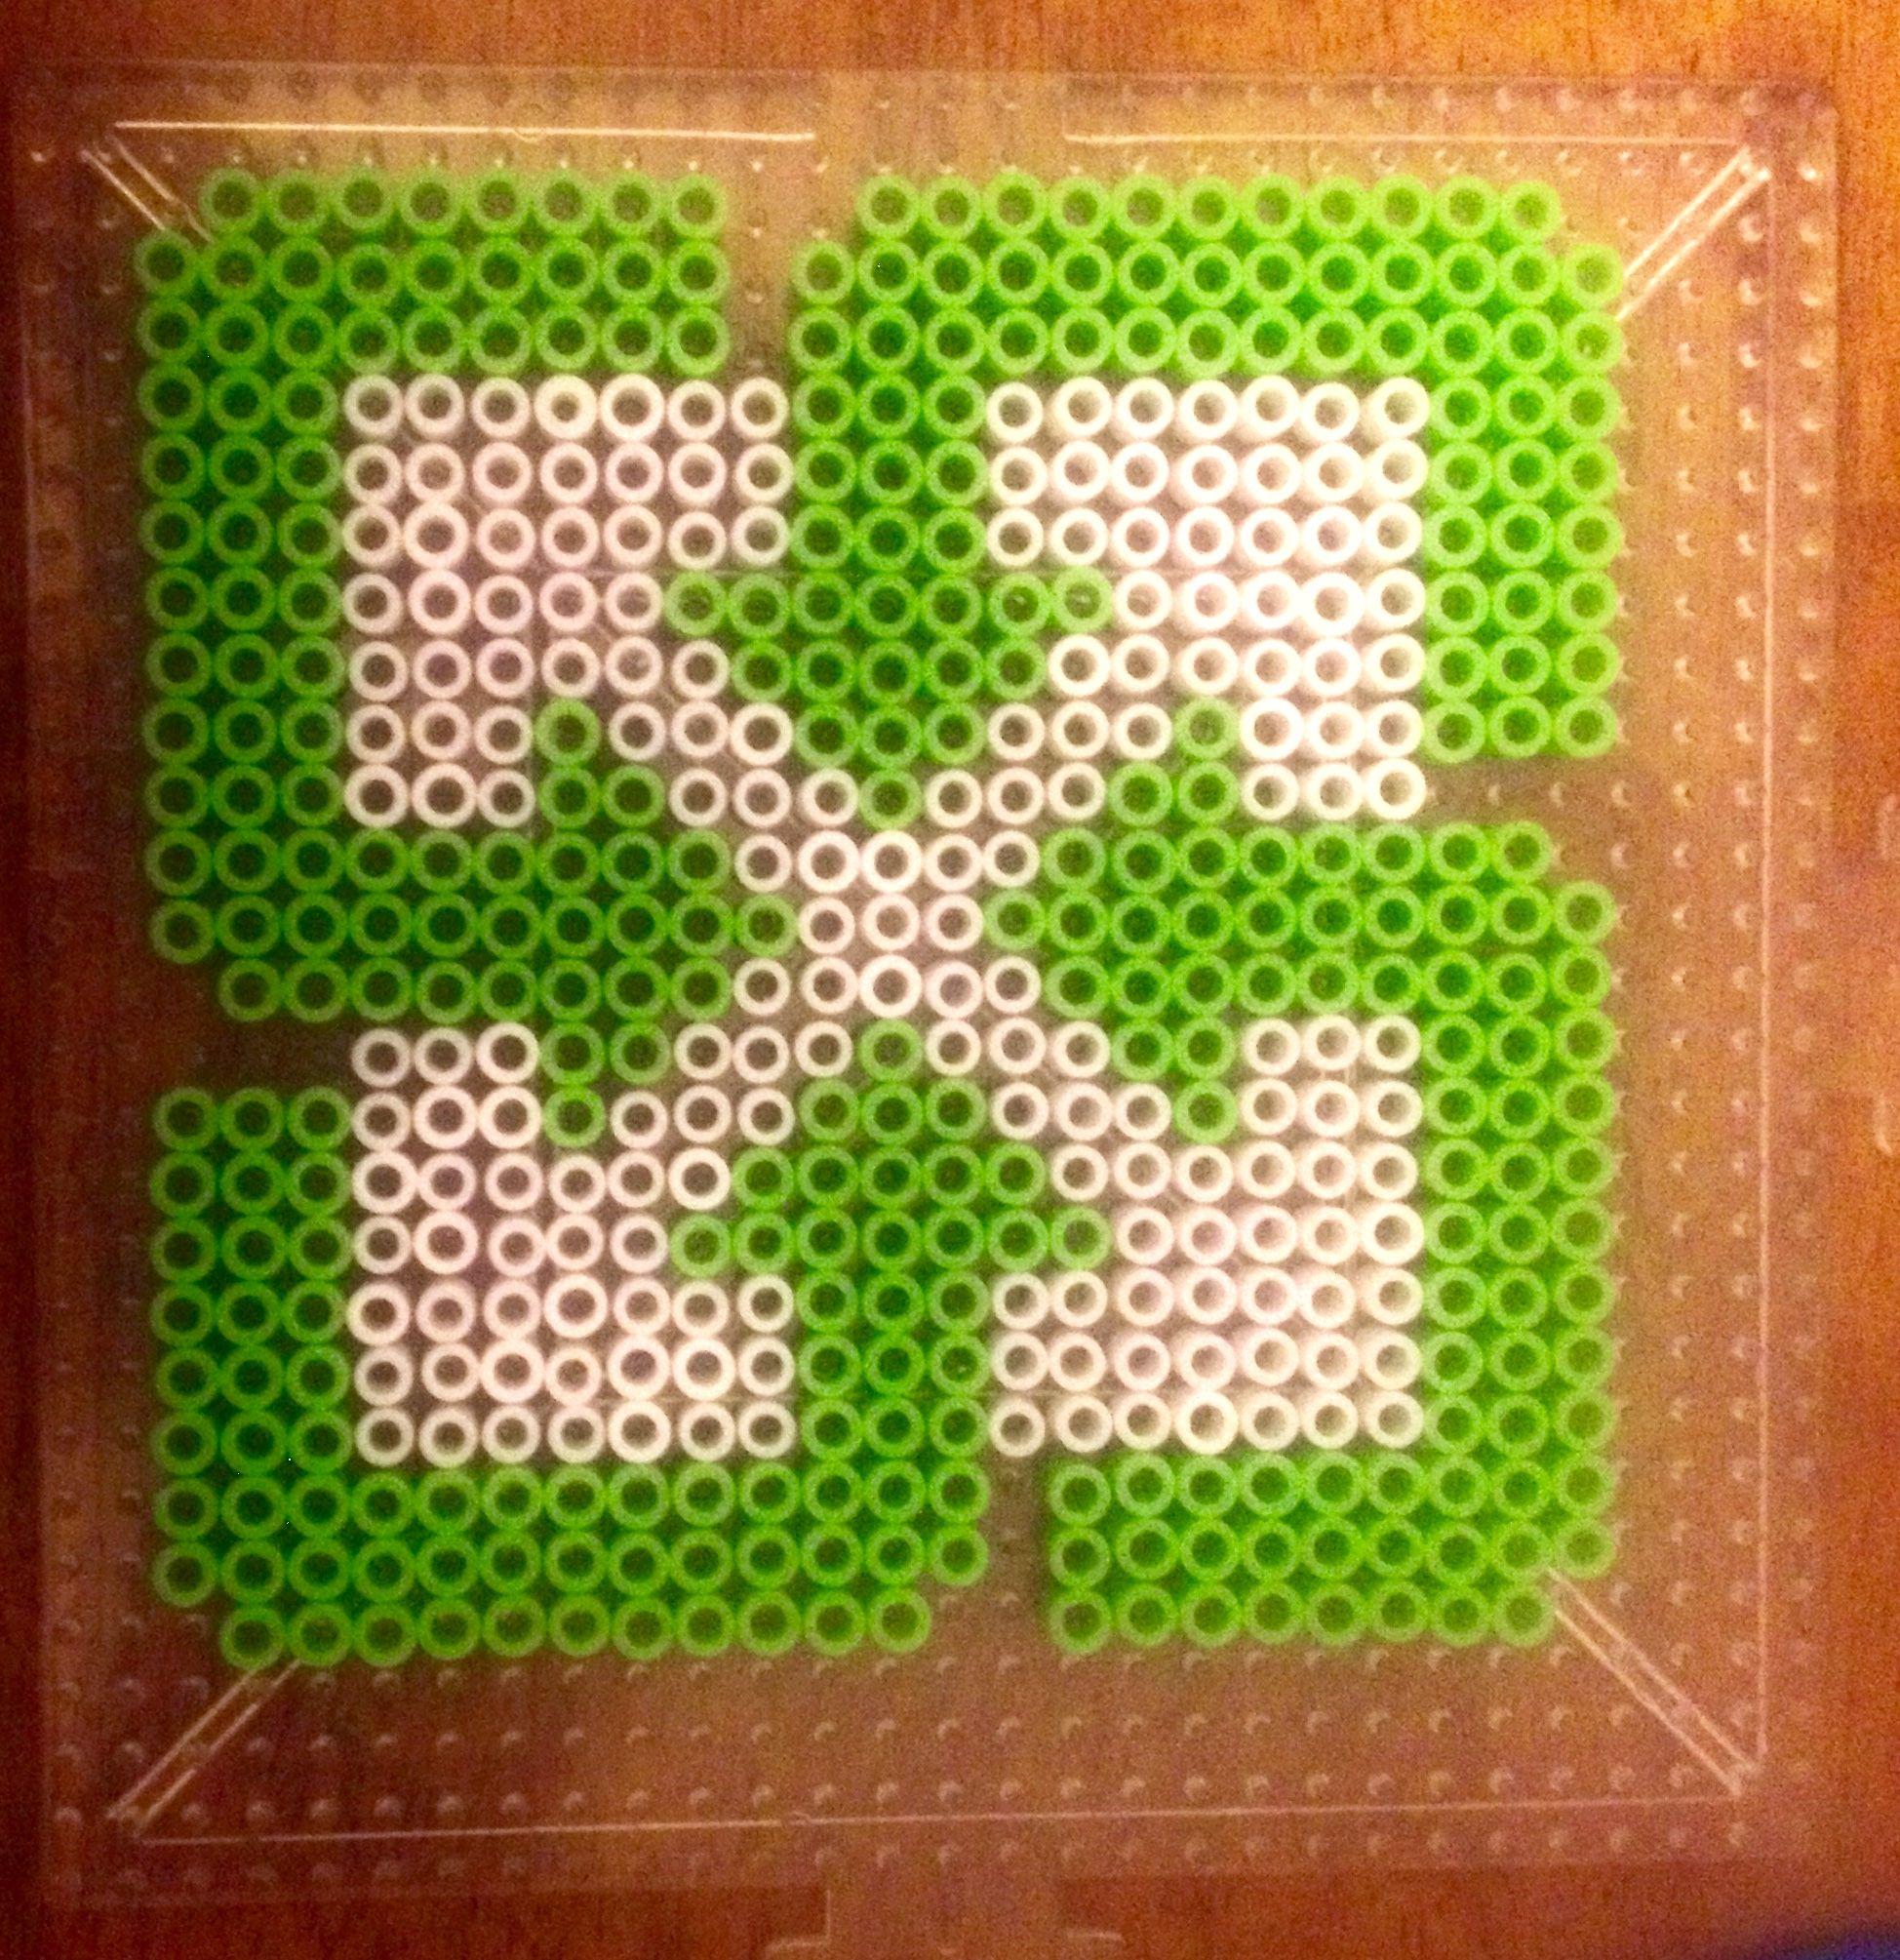 This is my original taiwan recycle symbol recycle melty this is my original taiwan recycle symbol buycottarizona Choice Image